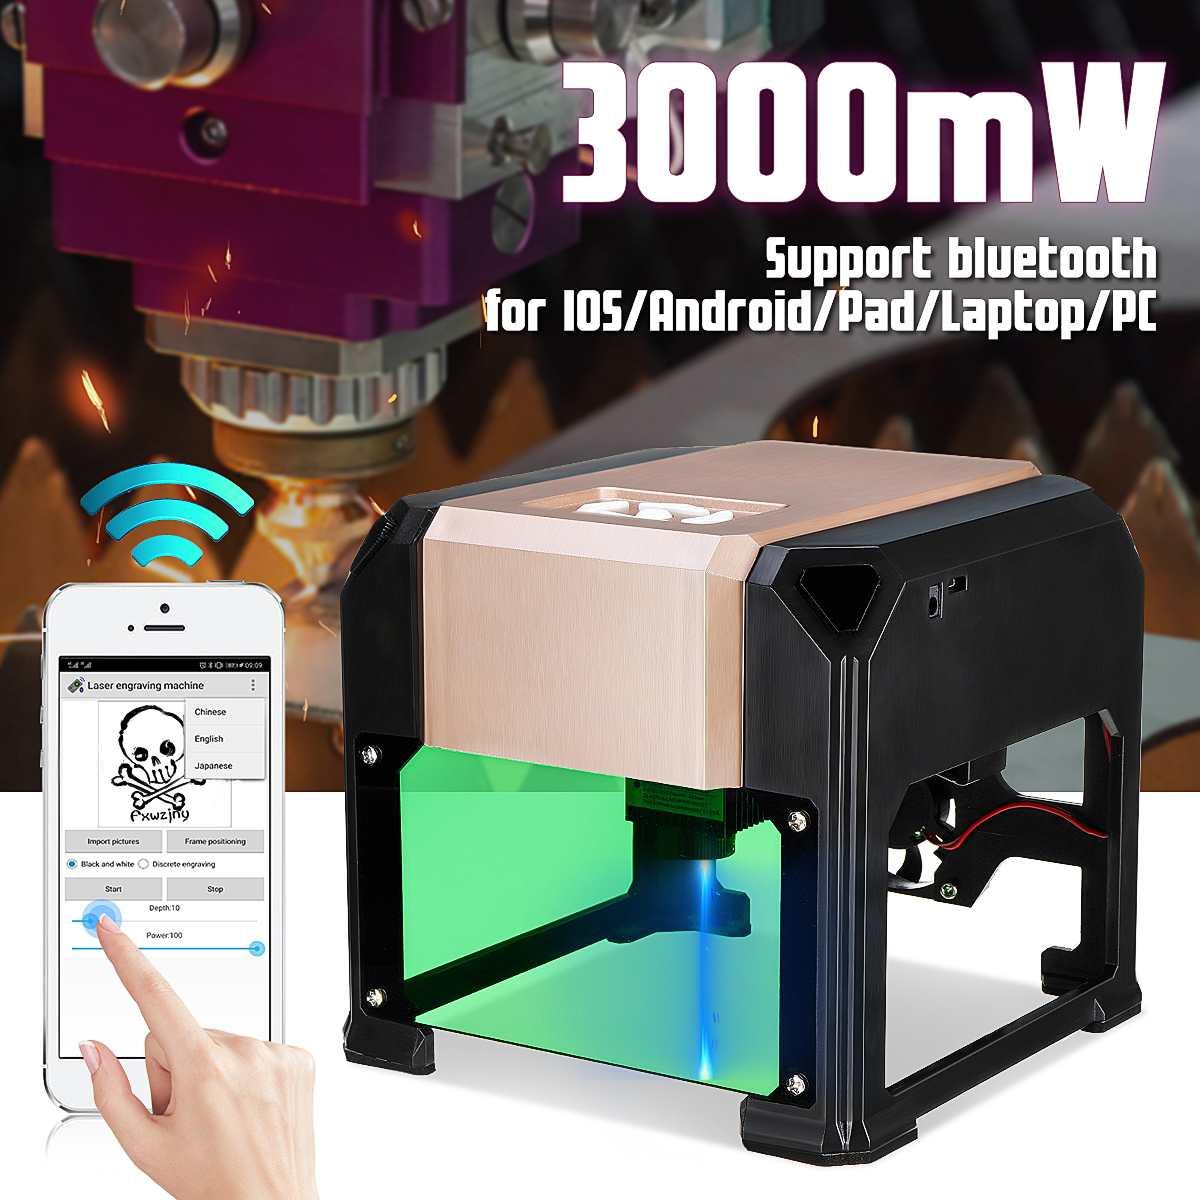 bluetooth Control 3000mW Professional DIY Desktop Mini CNC Laser Engraver Cutter Engraving Wood Cutting Machine Router 110 220V